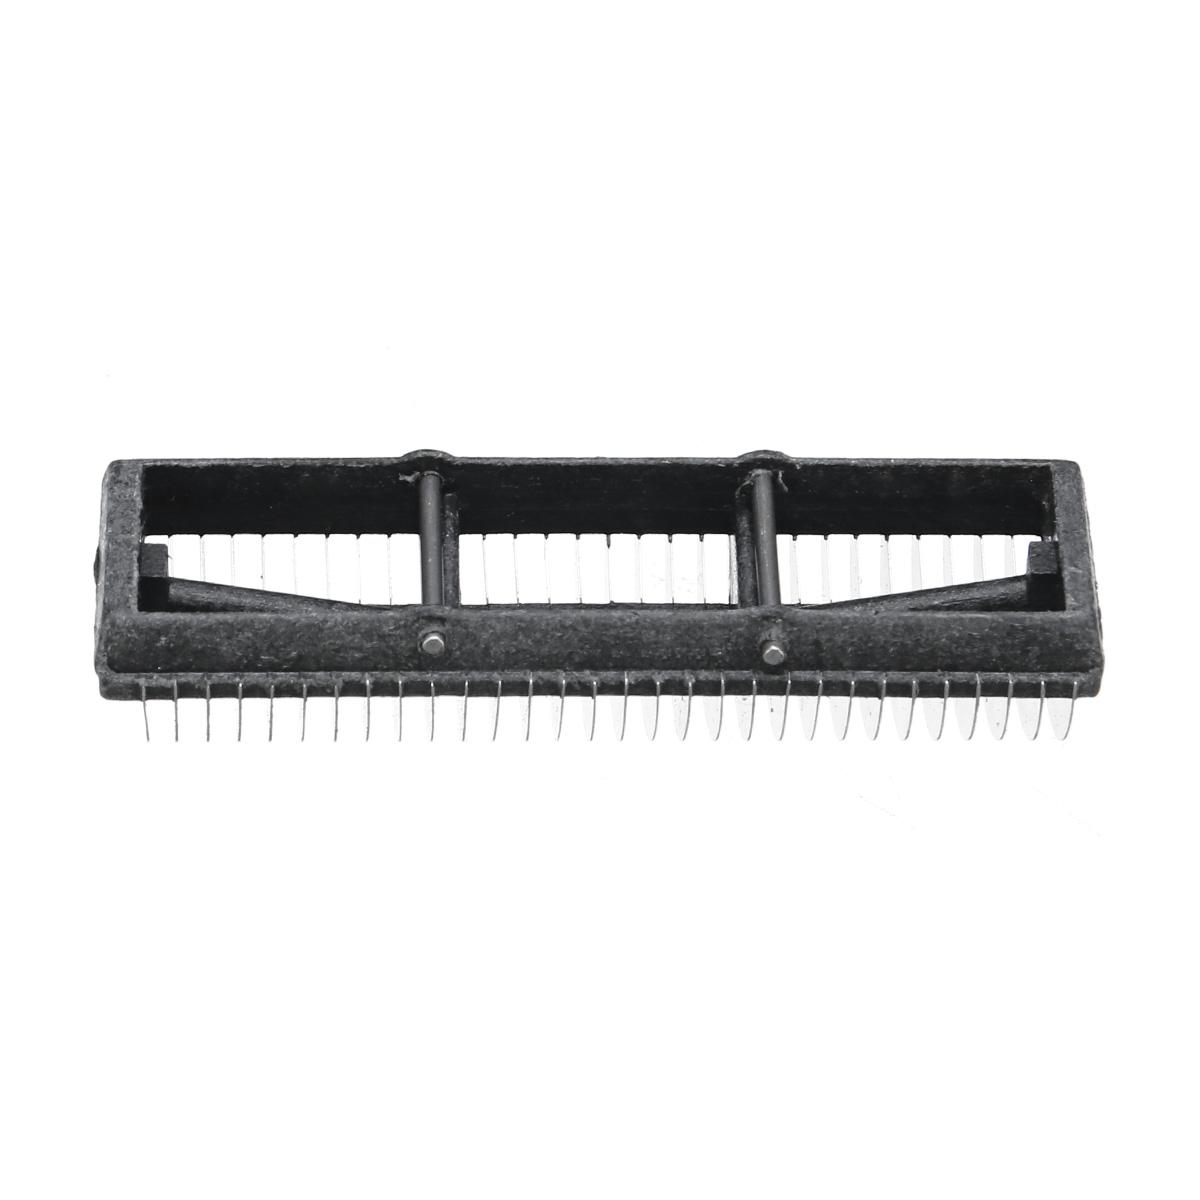 Shaver Razor Cutter Head Replacement For Braun 330 / 424 EU&US / 428 EU&US